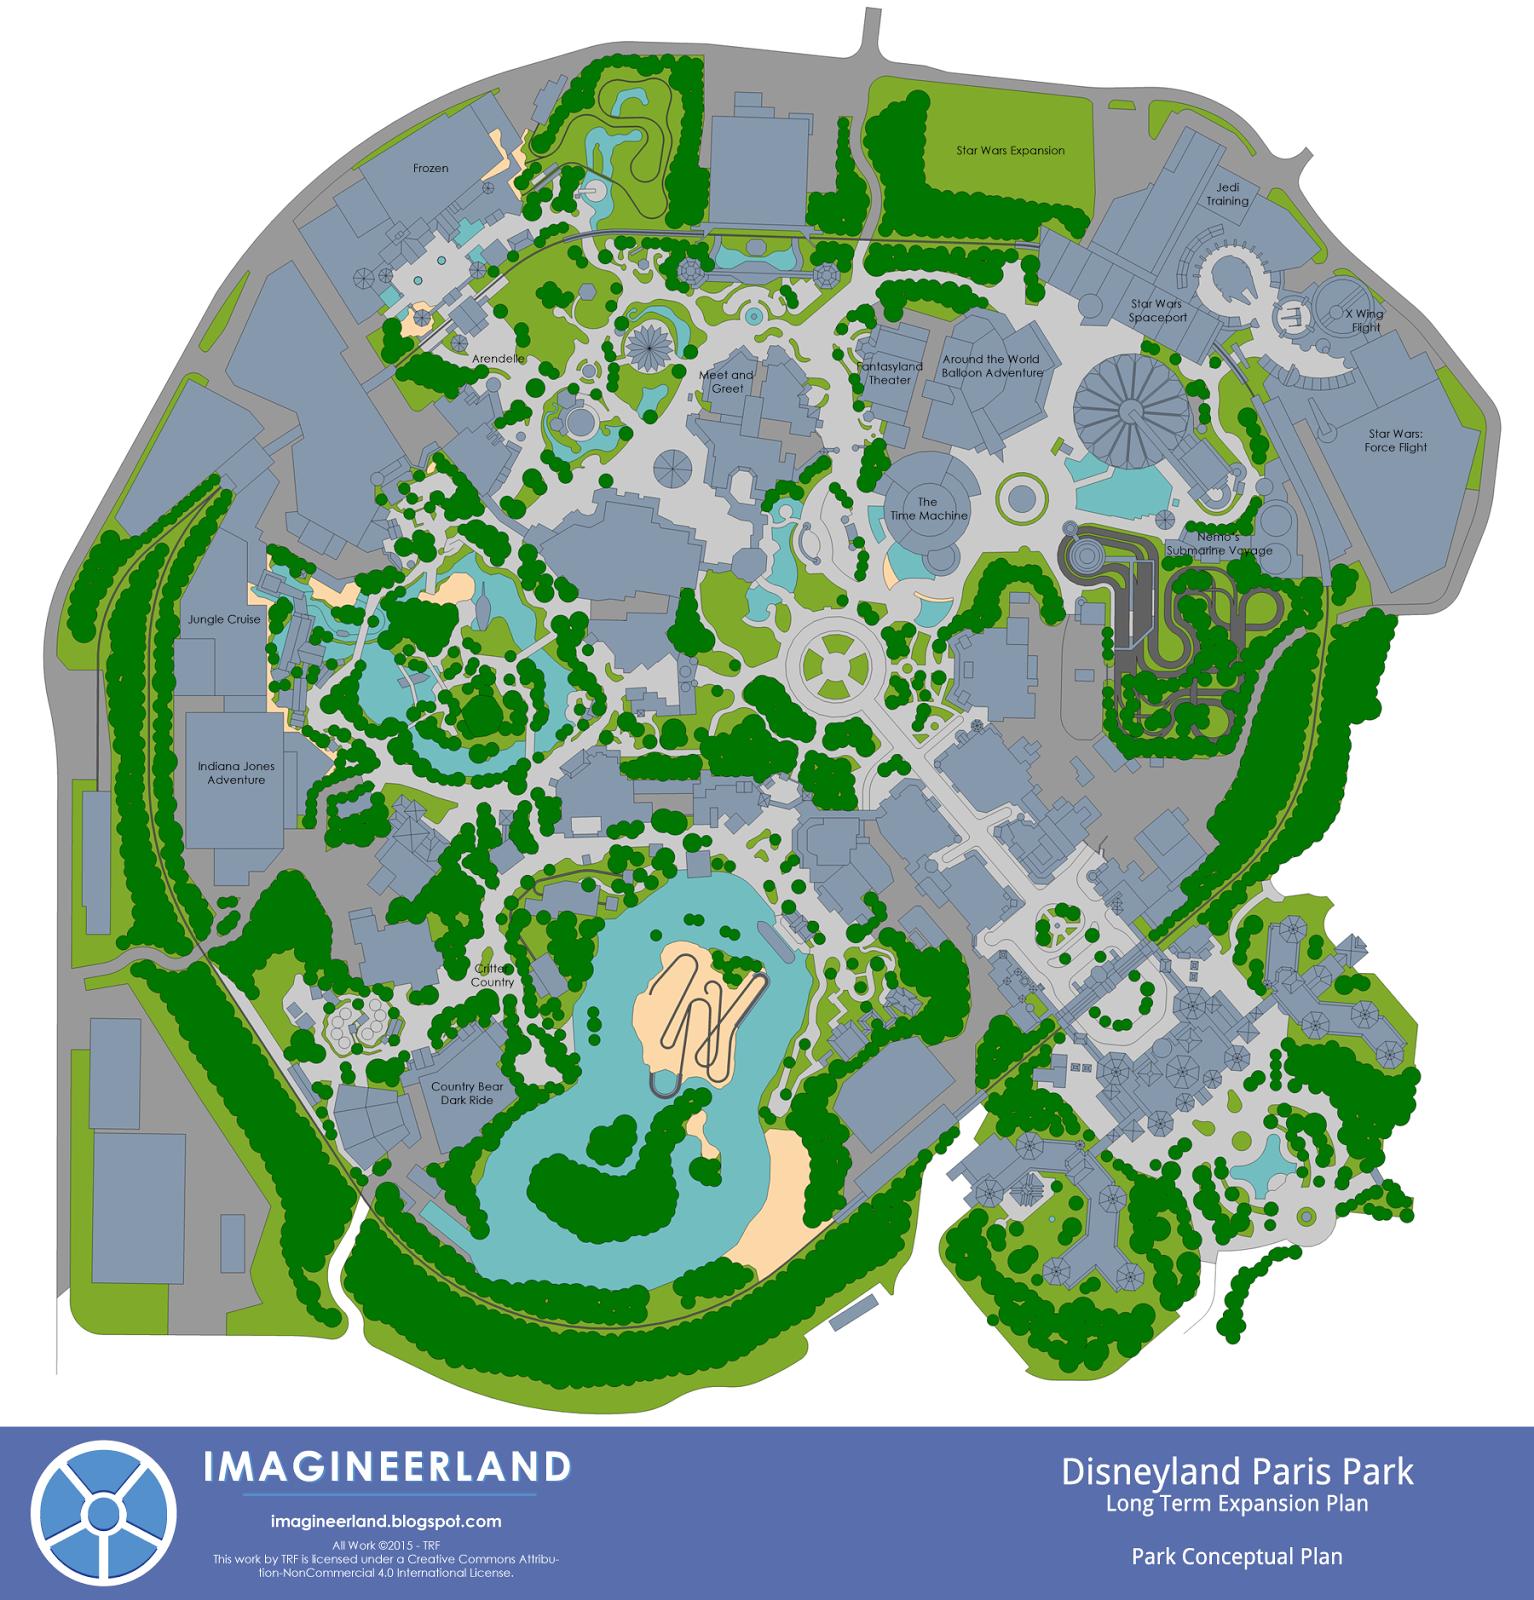 Imagineerland: Disneyland Paris Park Plan